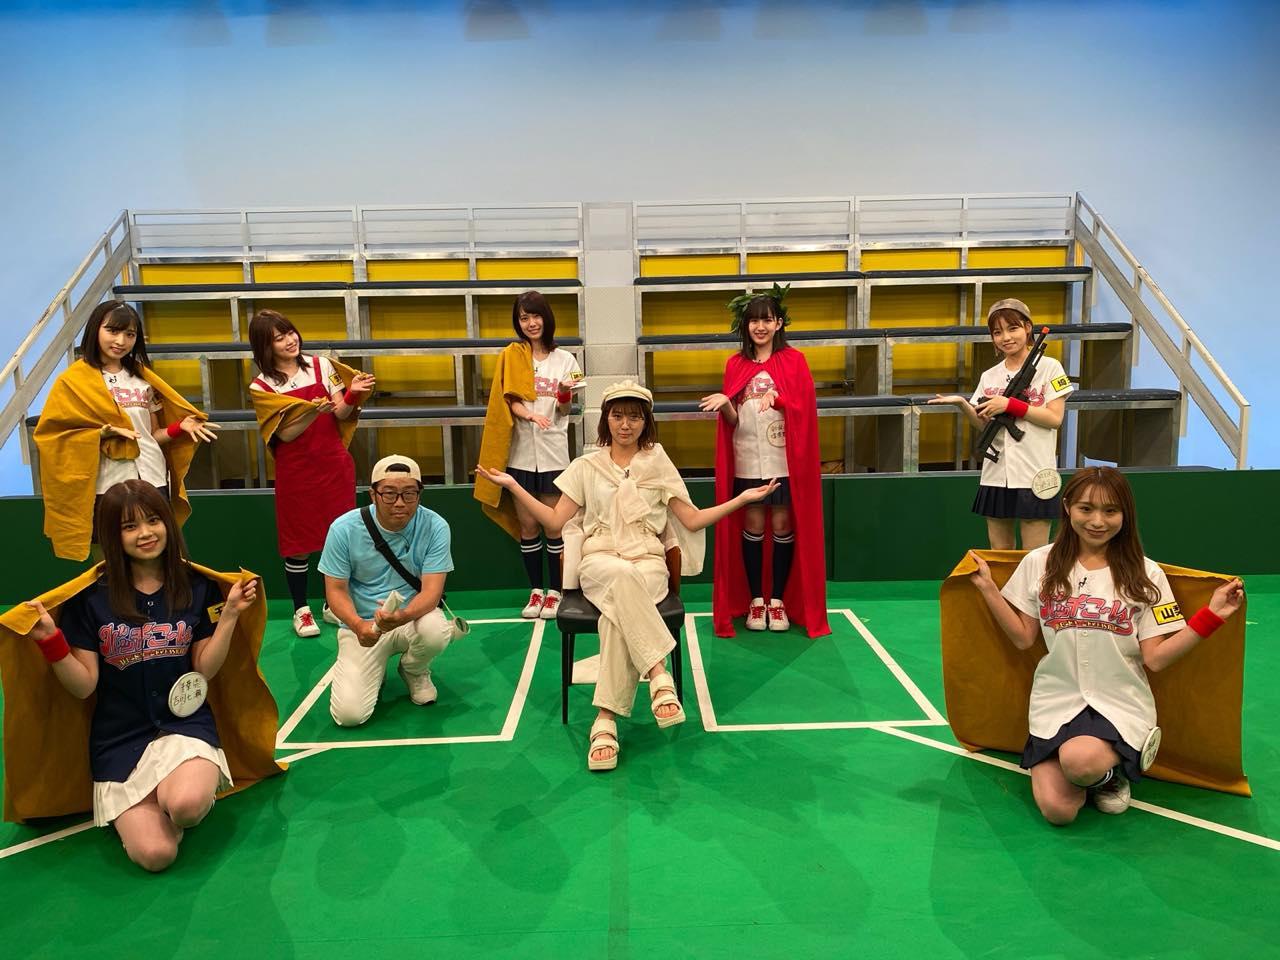 「AKB48チーム8のKANTO白書 バッチこーい!」#71:清水Dの劇団「バチこい」旗揚げ公演でバッチバチ!